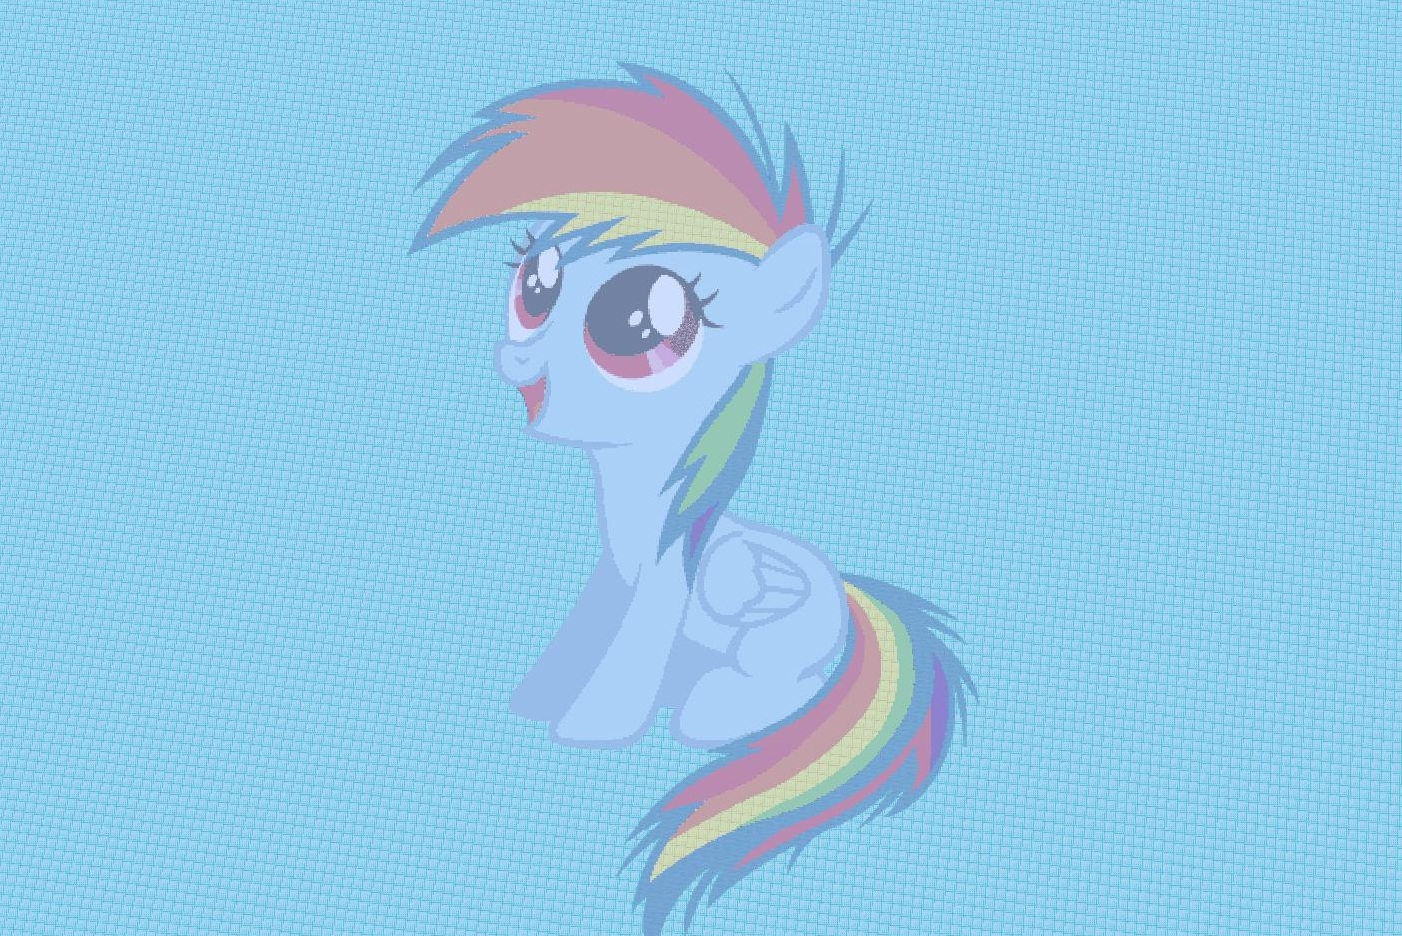 Rainbow Dash Young My little pony rainbow dash